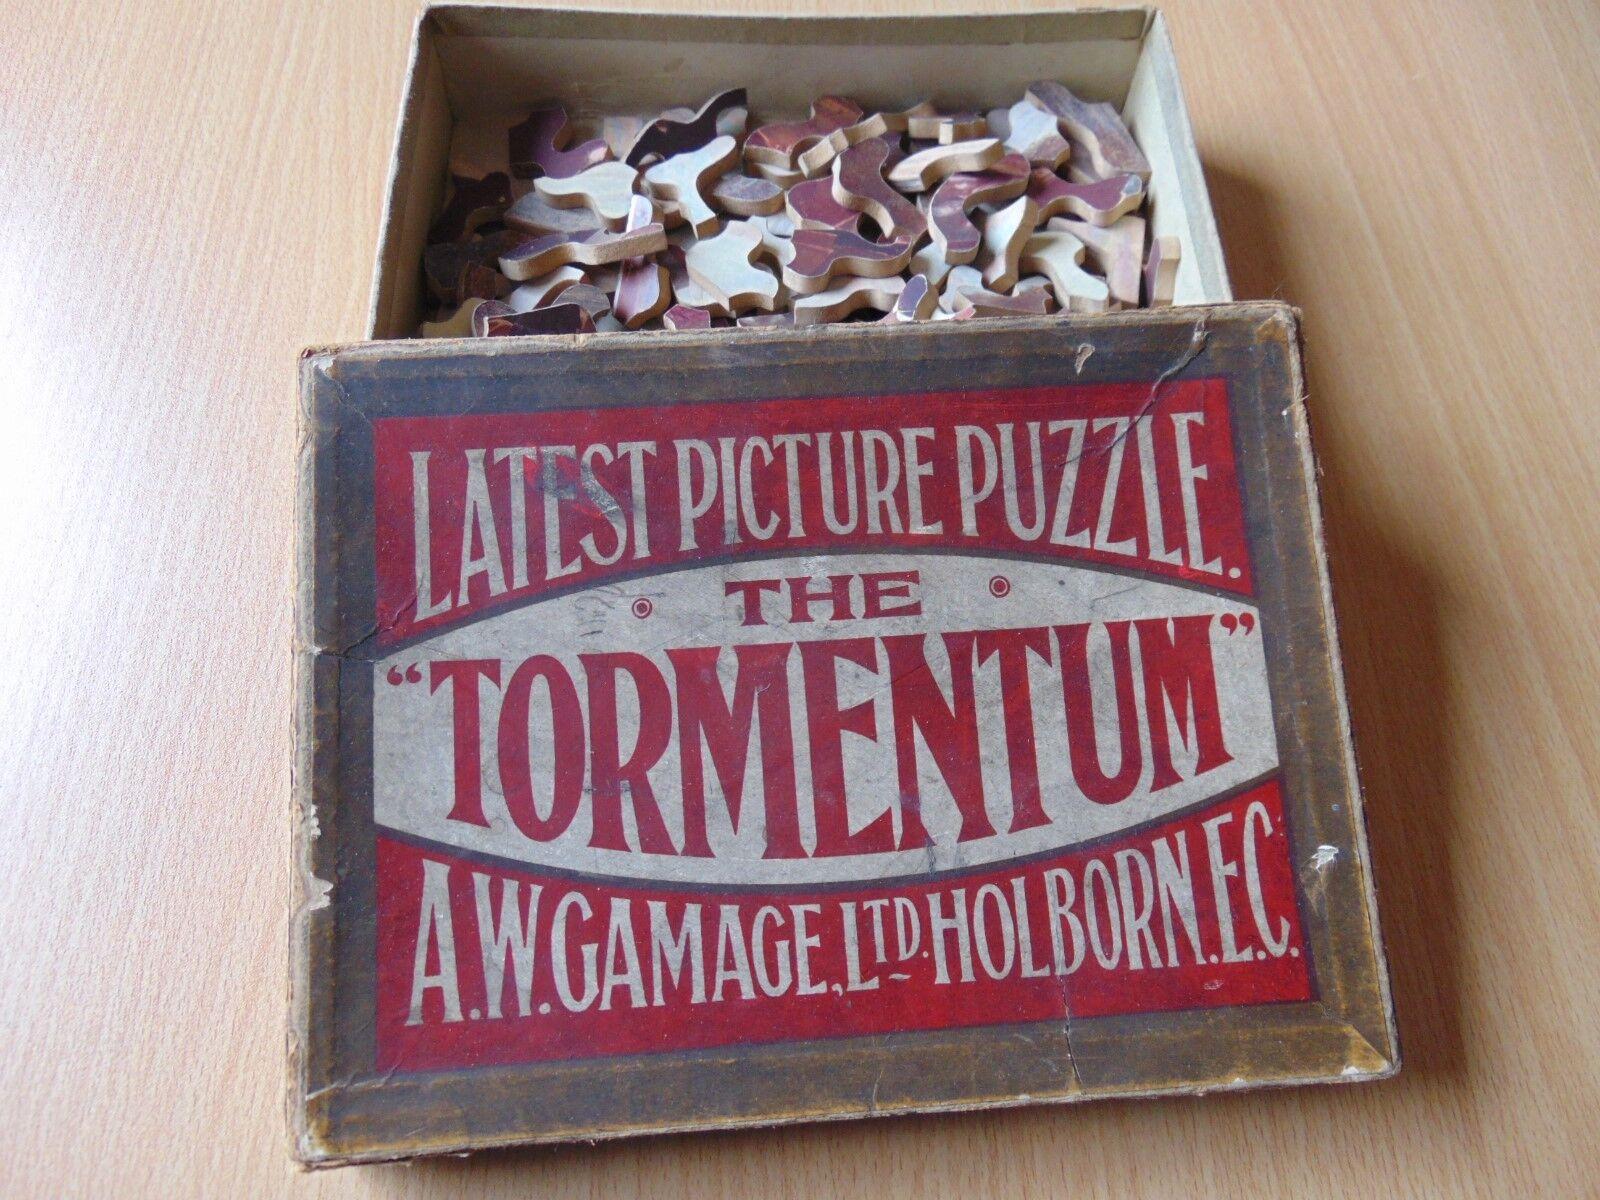 Knappe doppelseitig holz - puzzle tormentum gamage holborn kunst serie